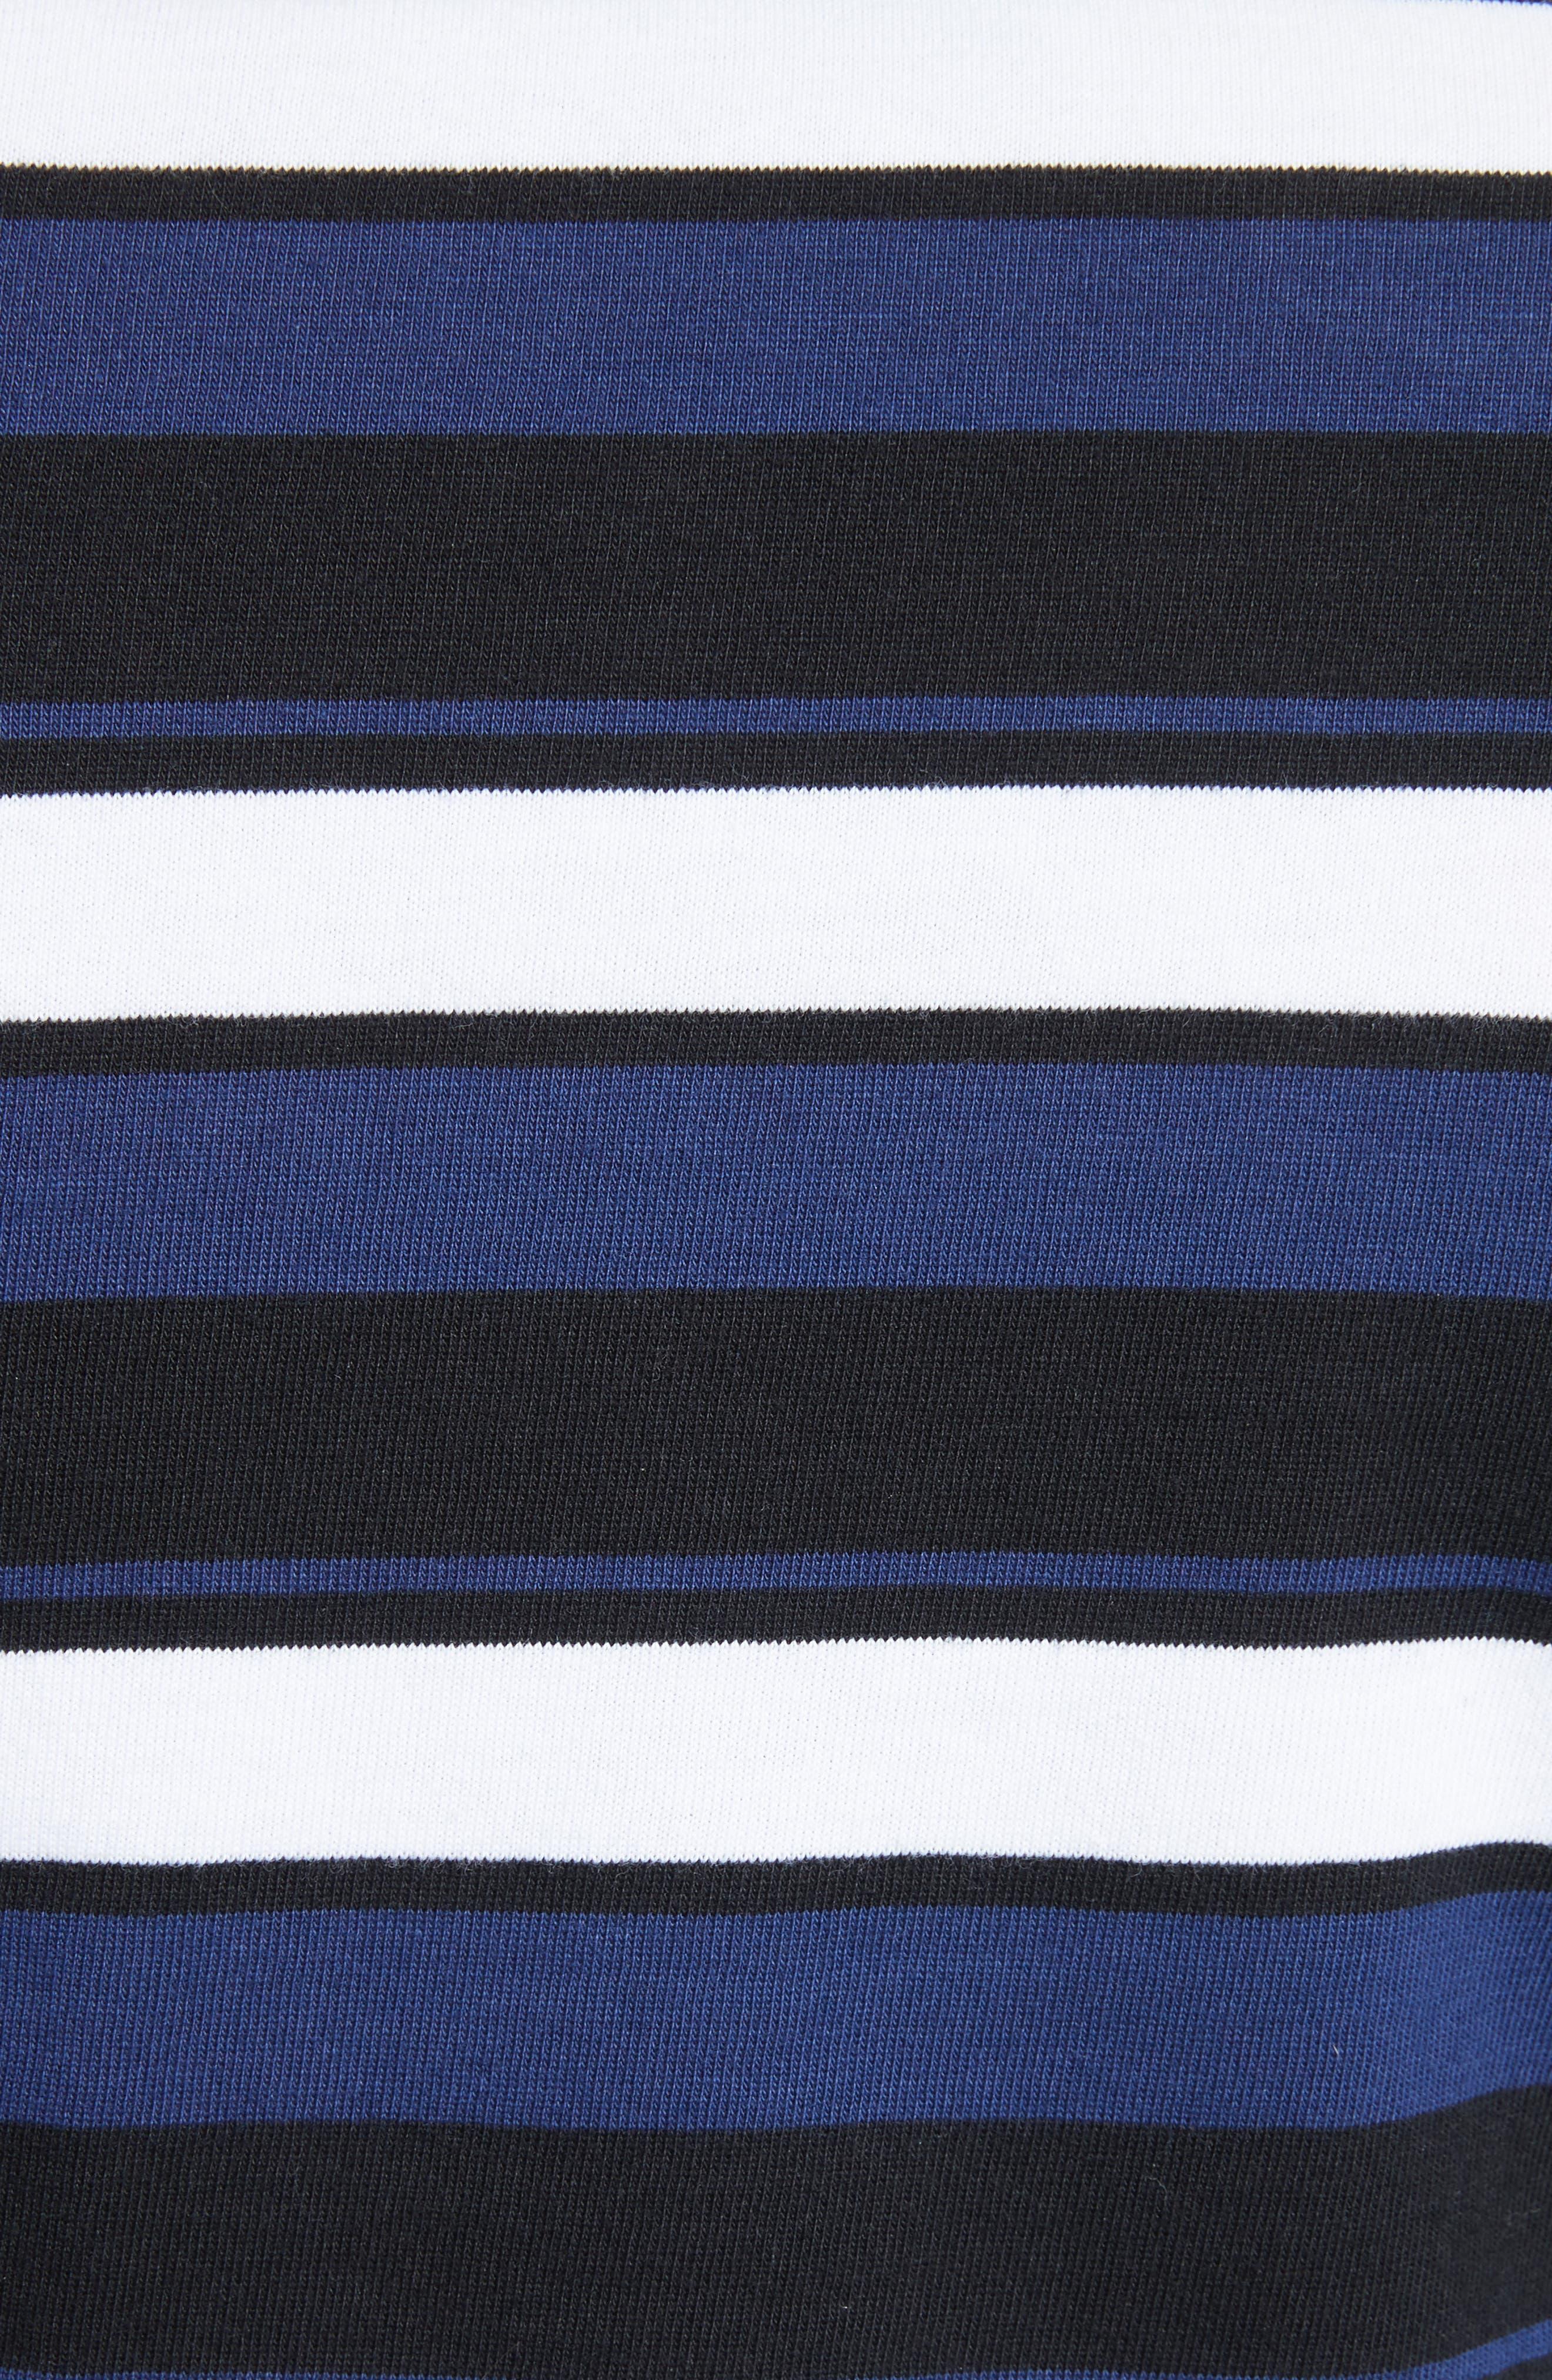 Stripe Crop Tee,                             Alternate thumbnail 5, color,                             003